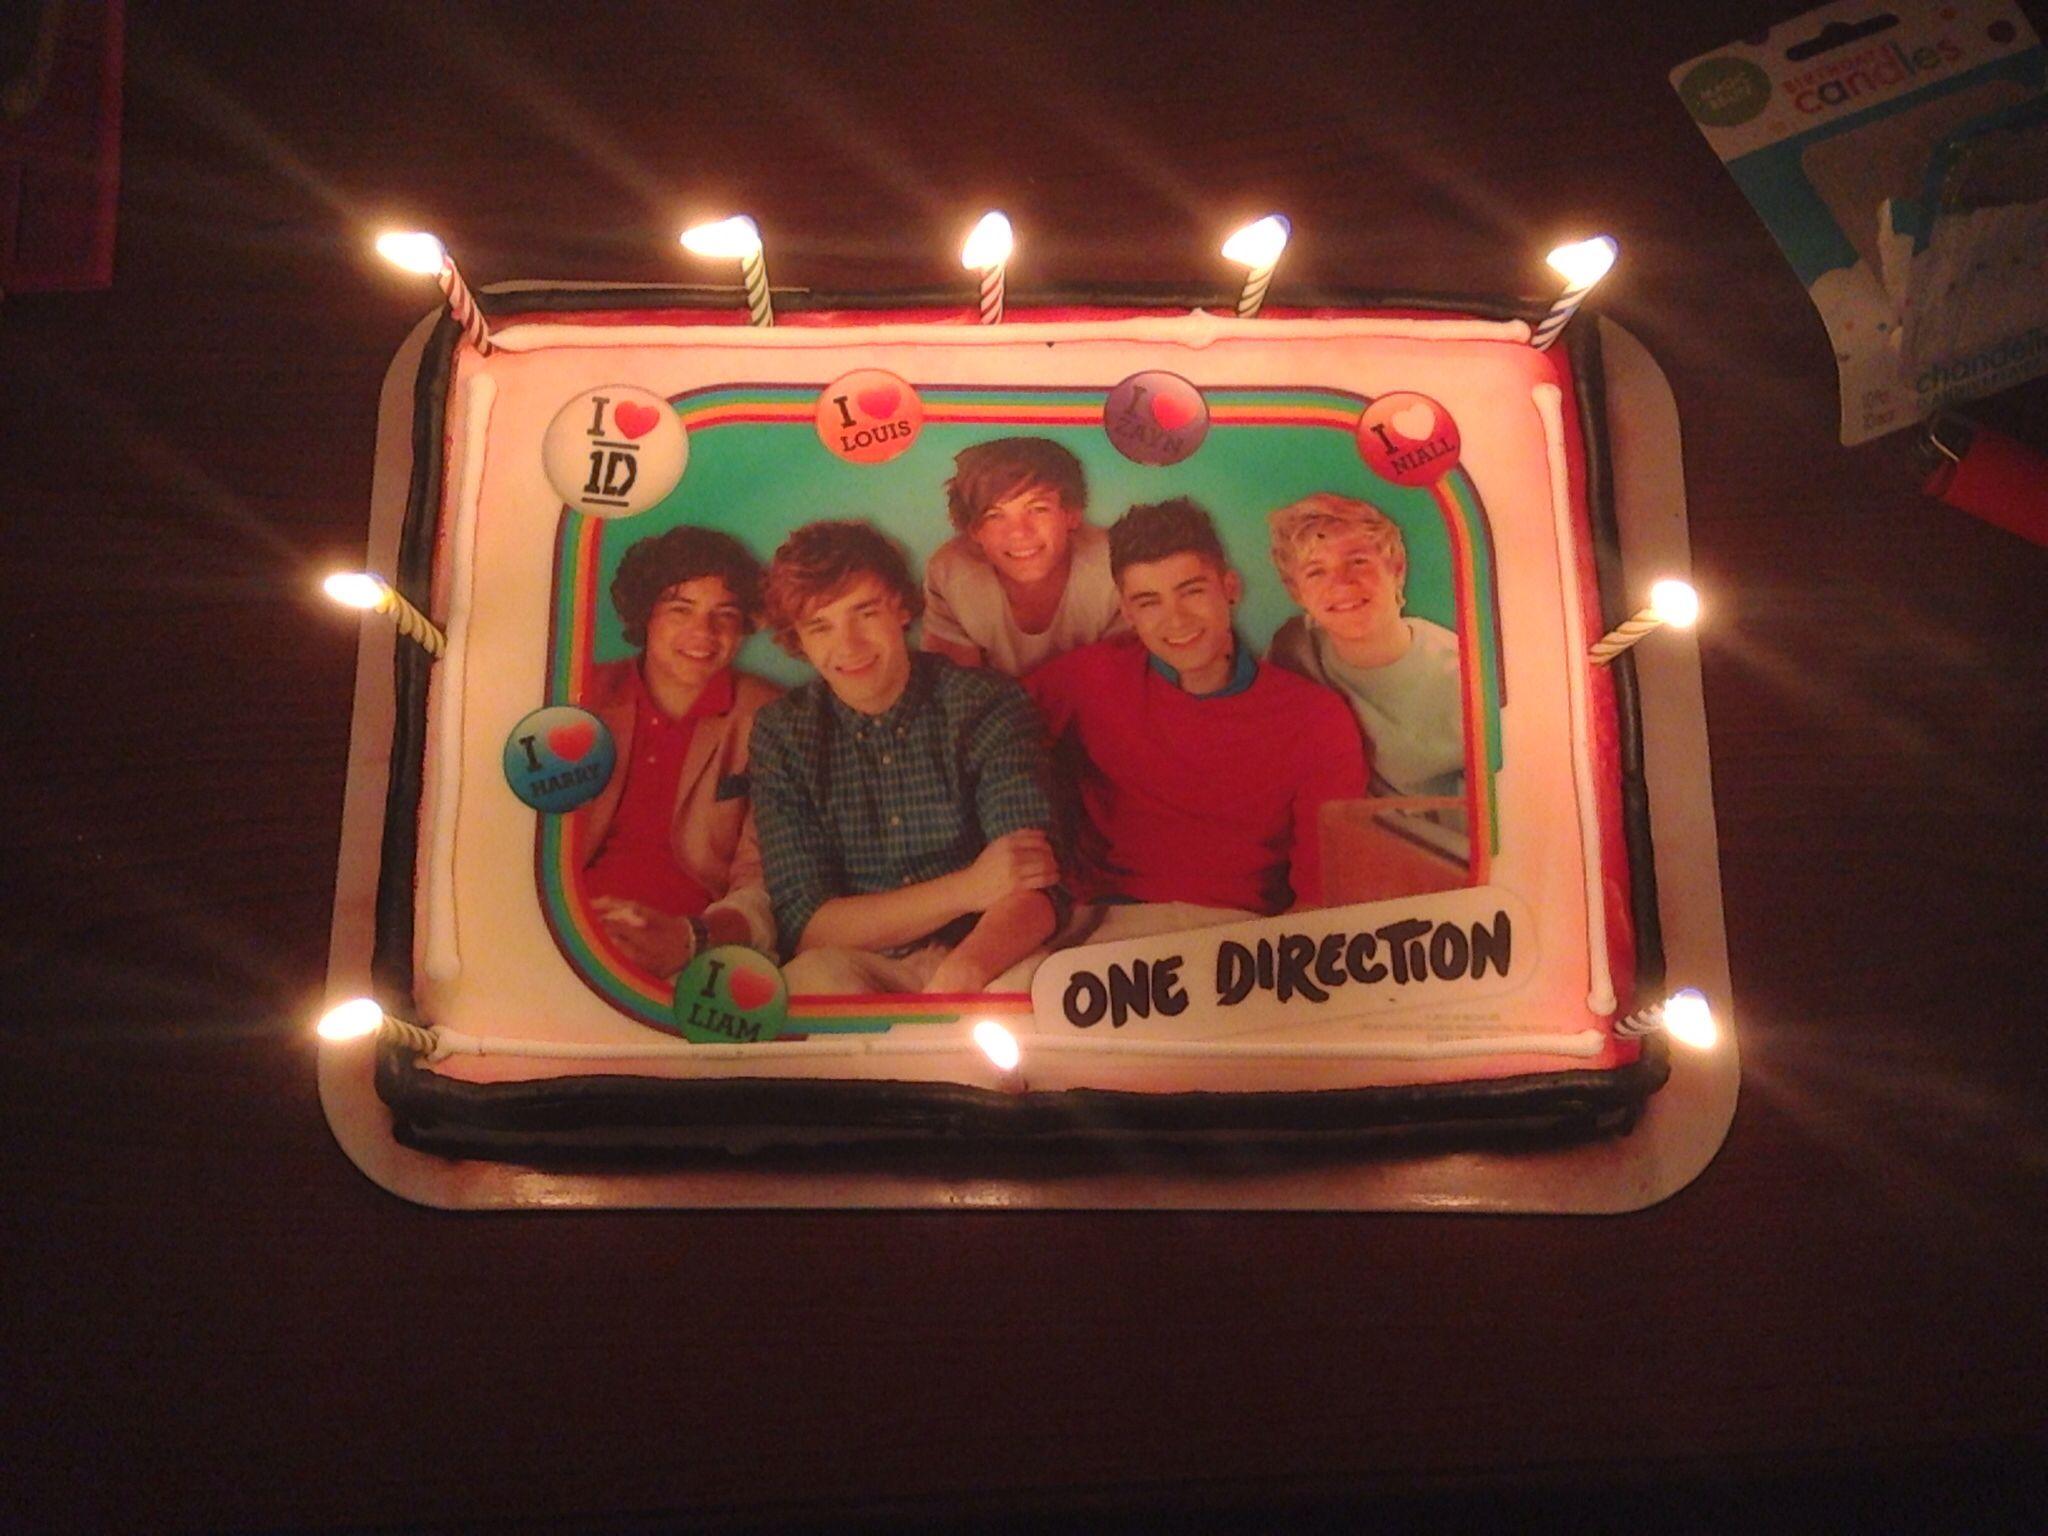 1d bday cake